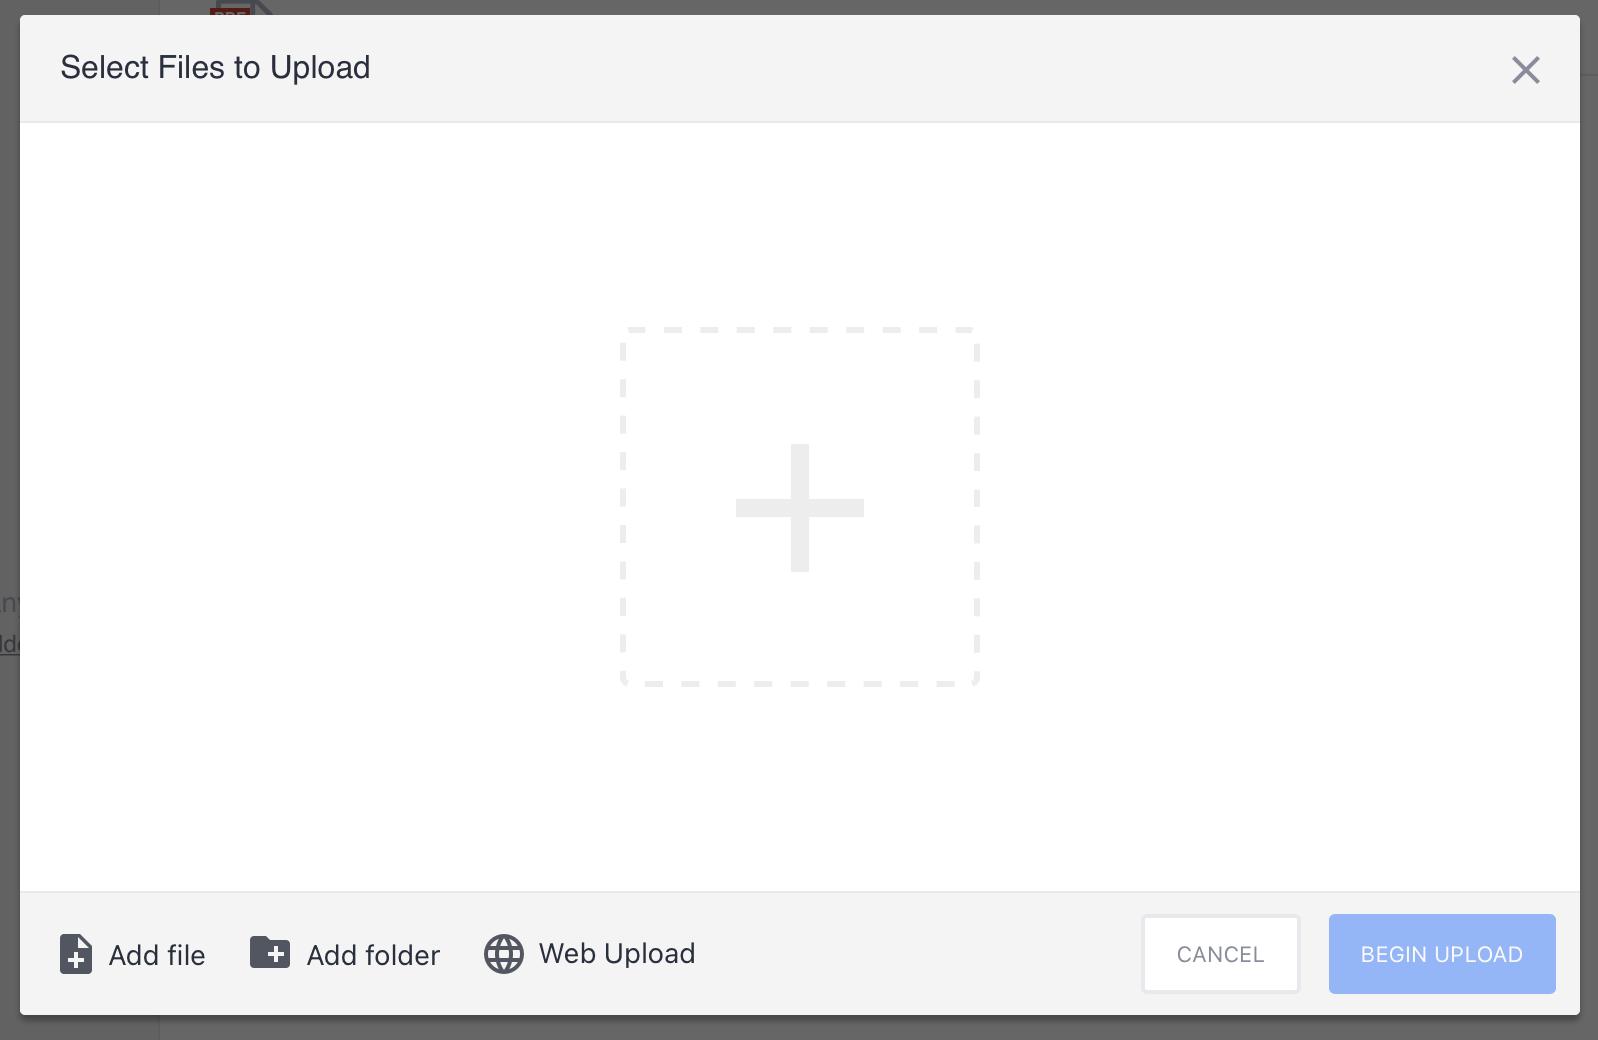 Upload File to Mediafire